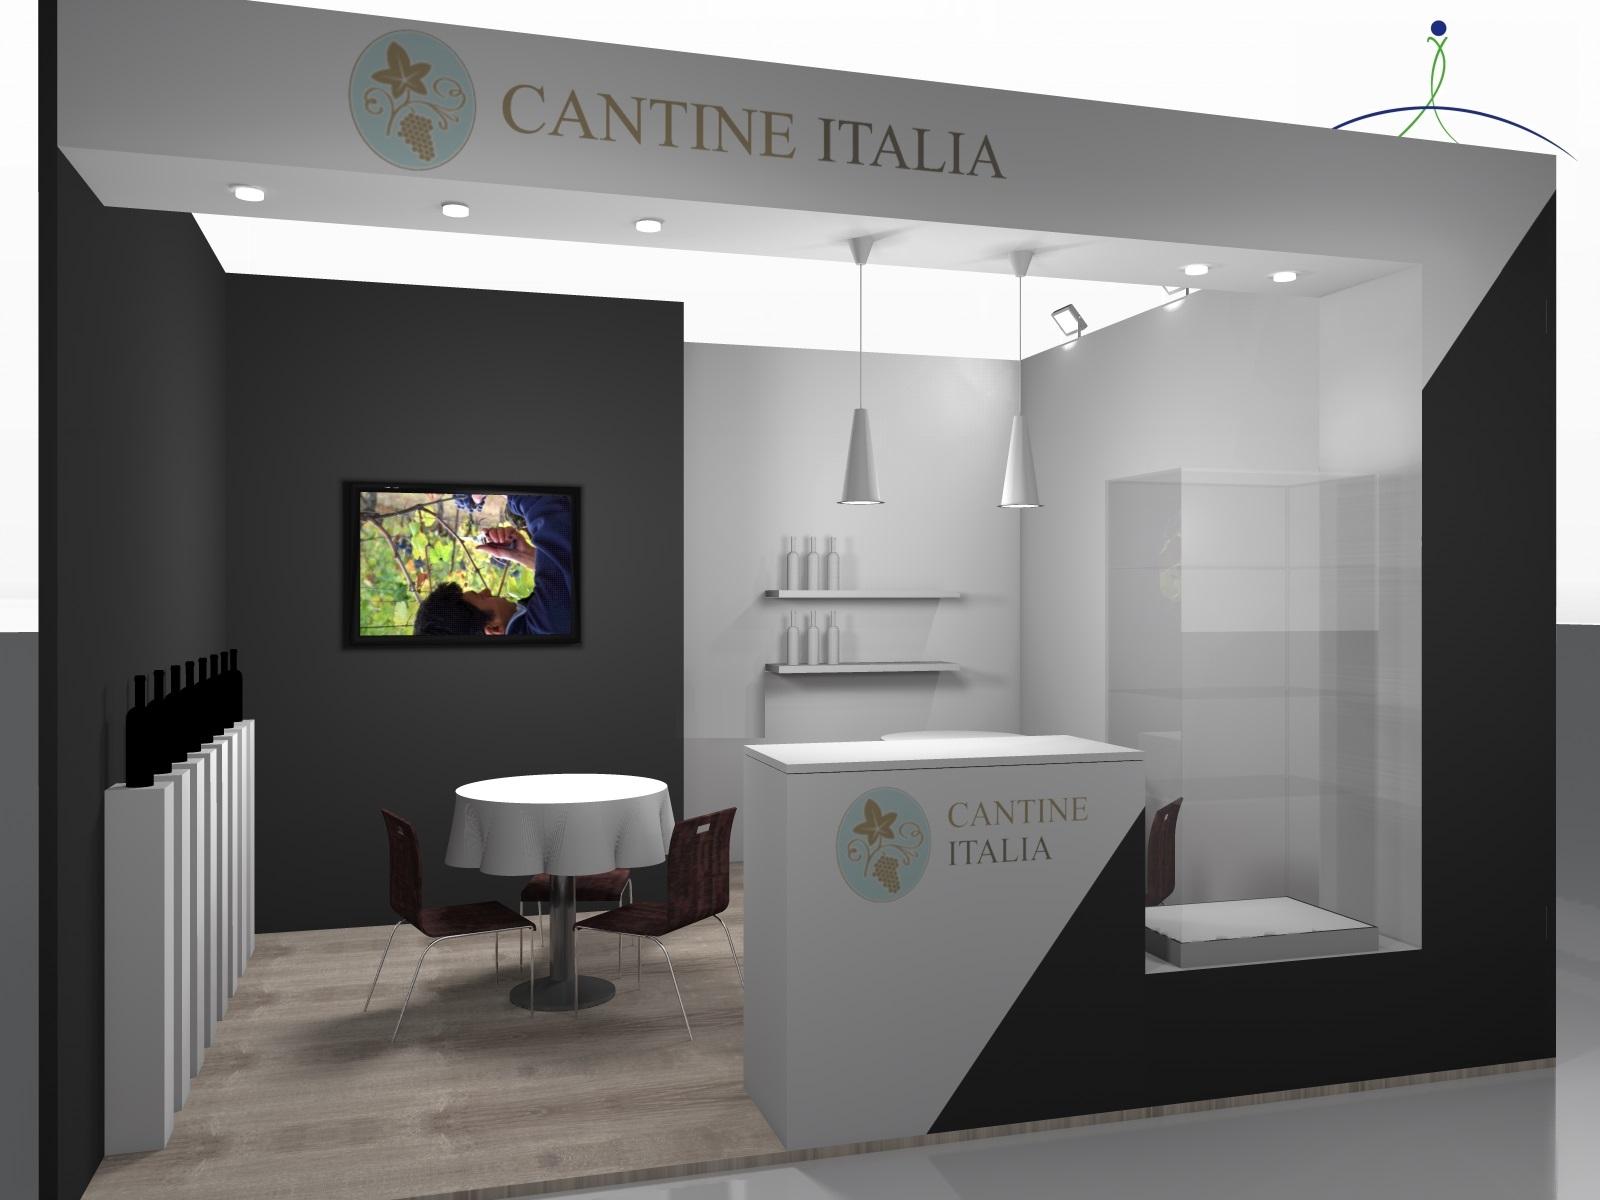 CANTINE ITALIA